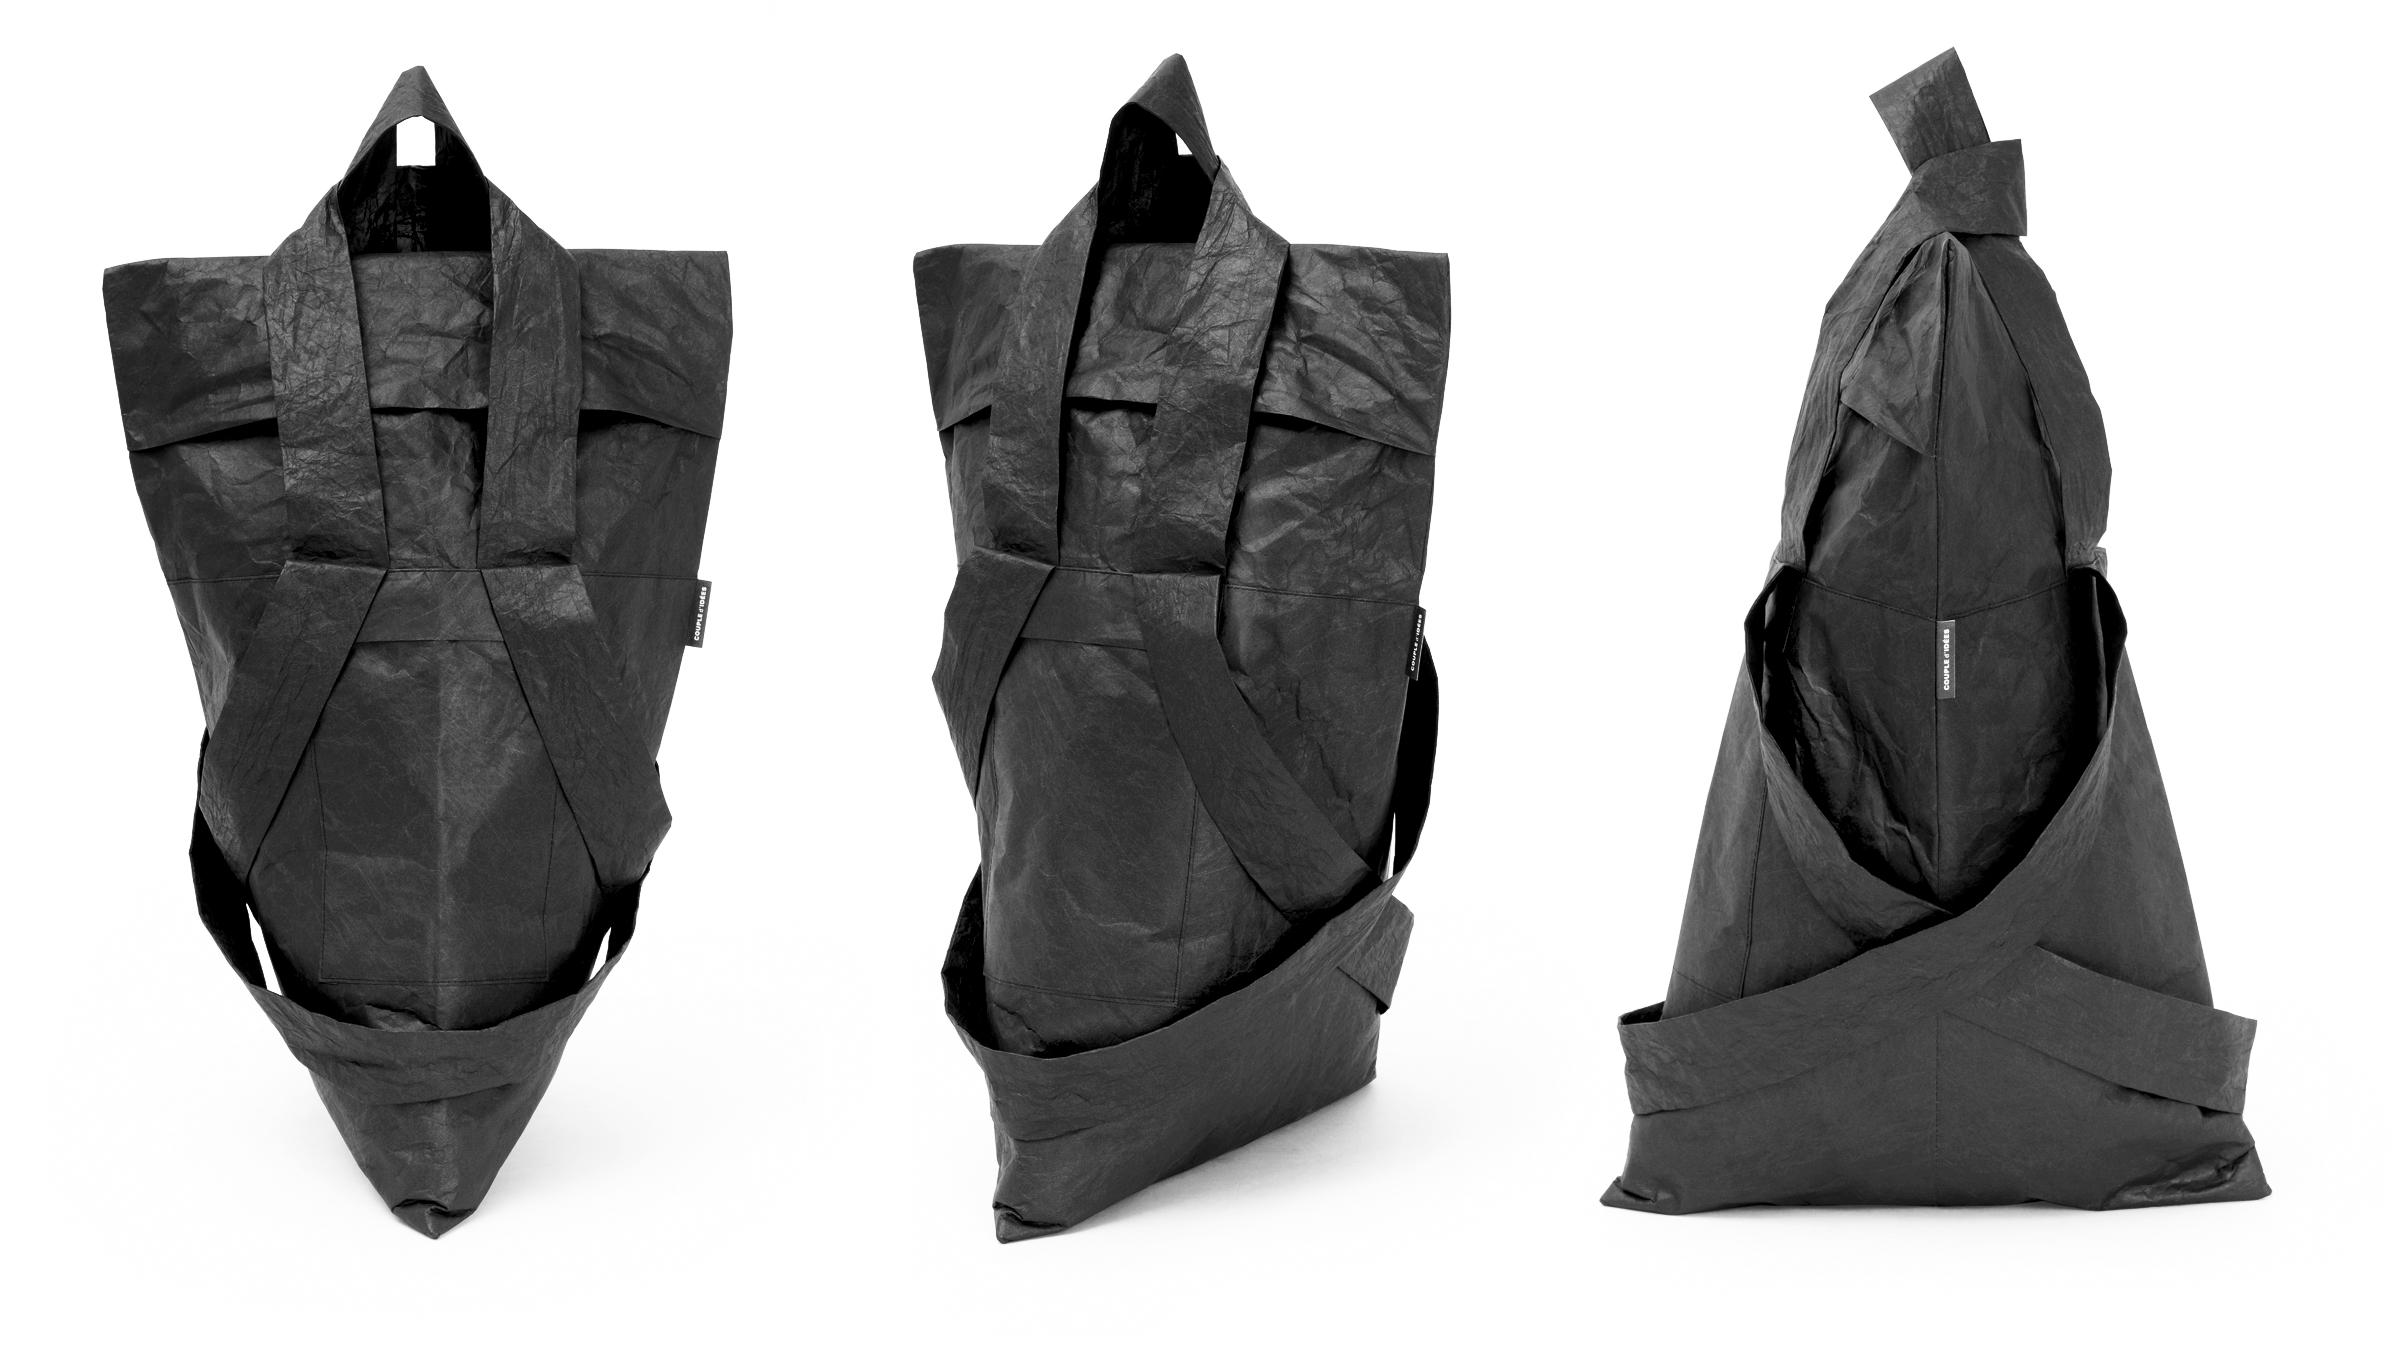 Urban Bag by Diane Parenteau / COUPLE D'IDEES - Creative Work - $i